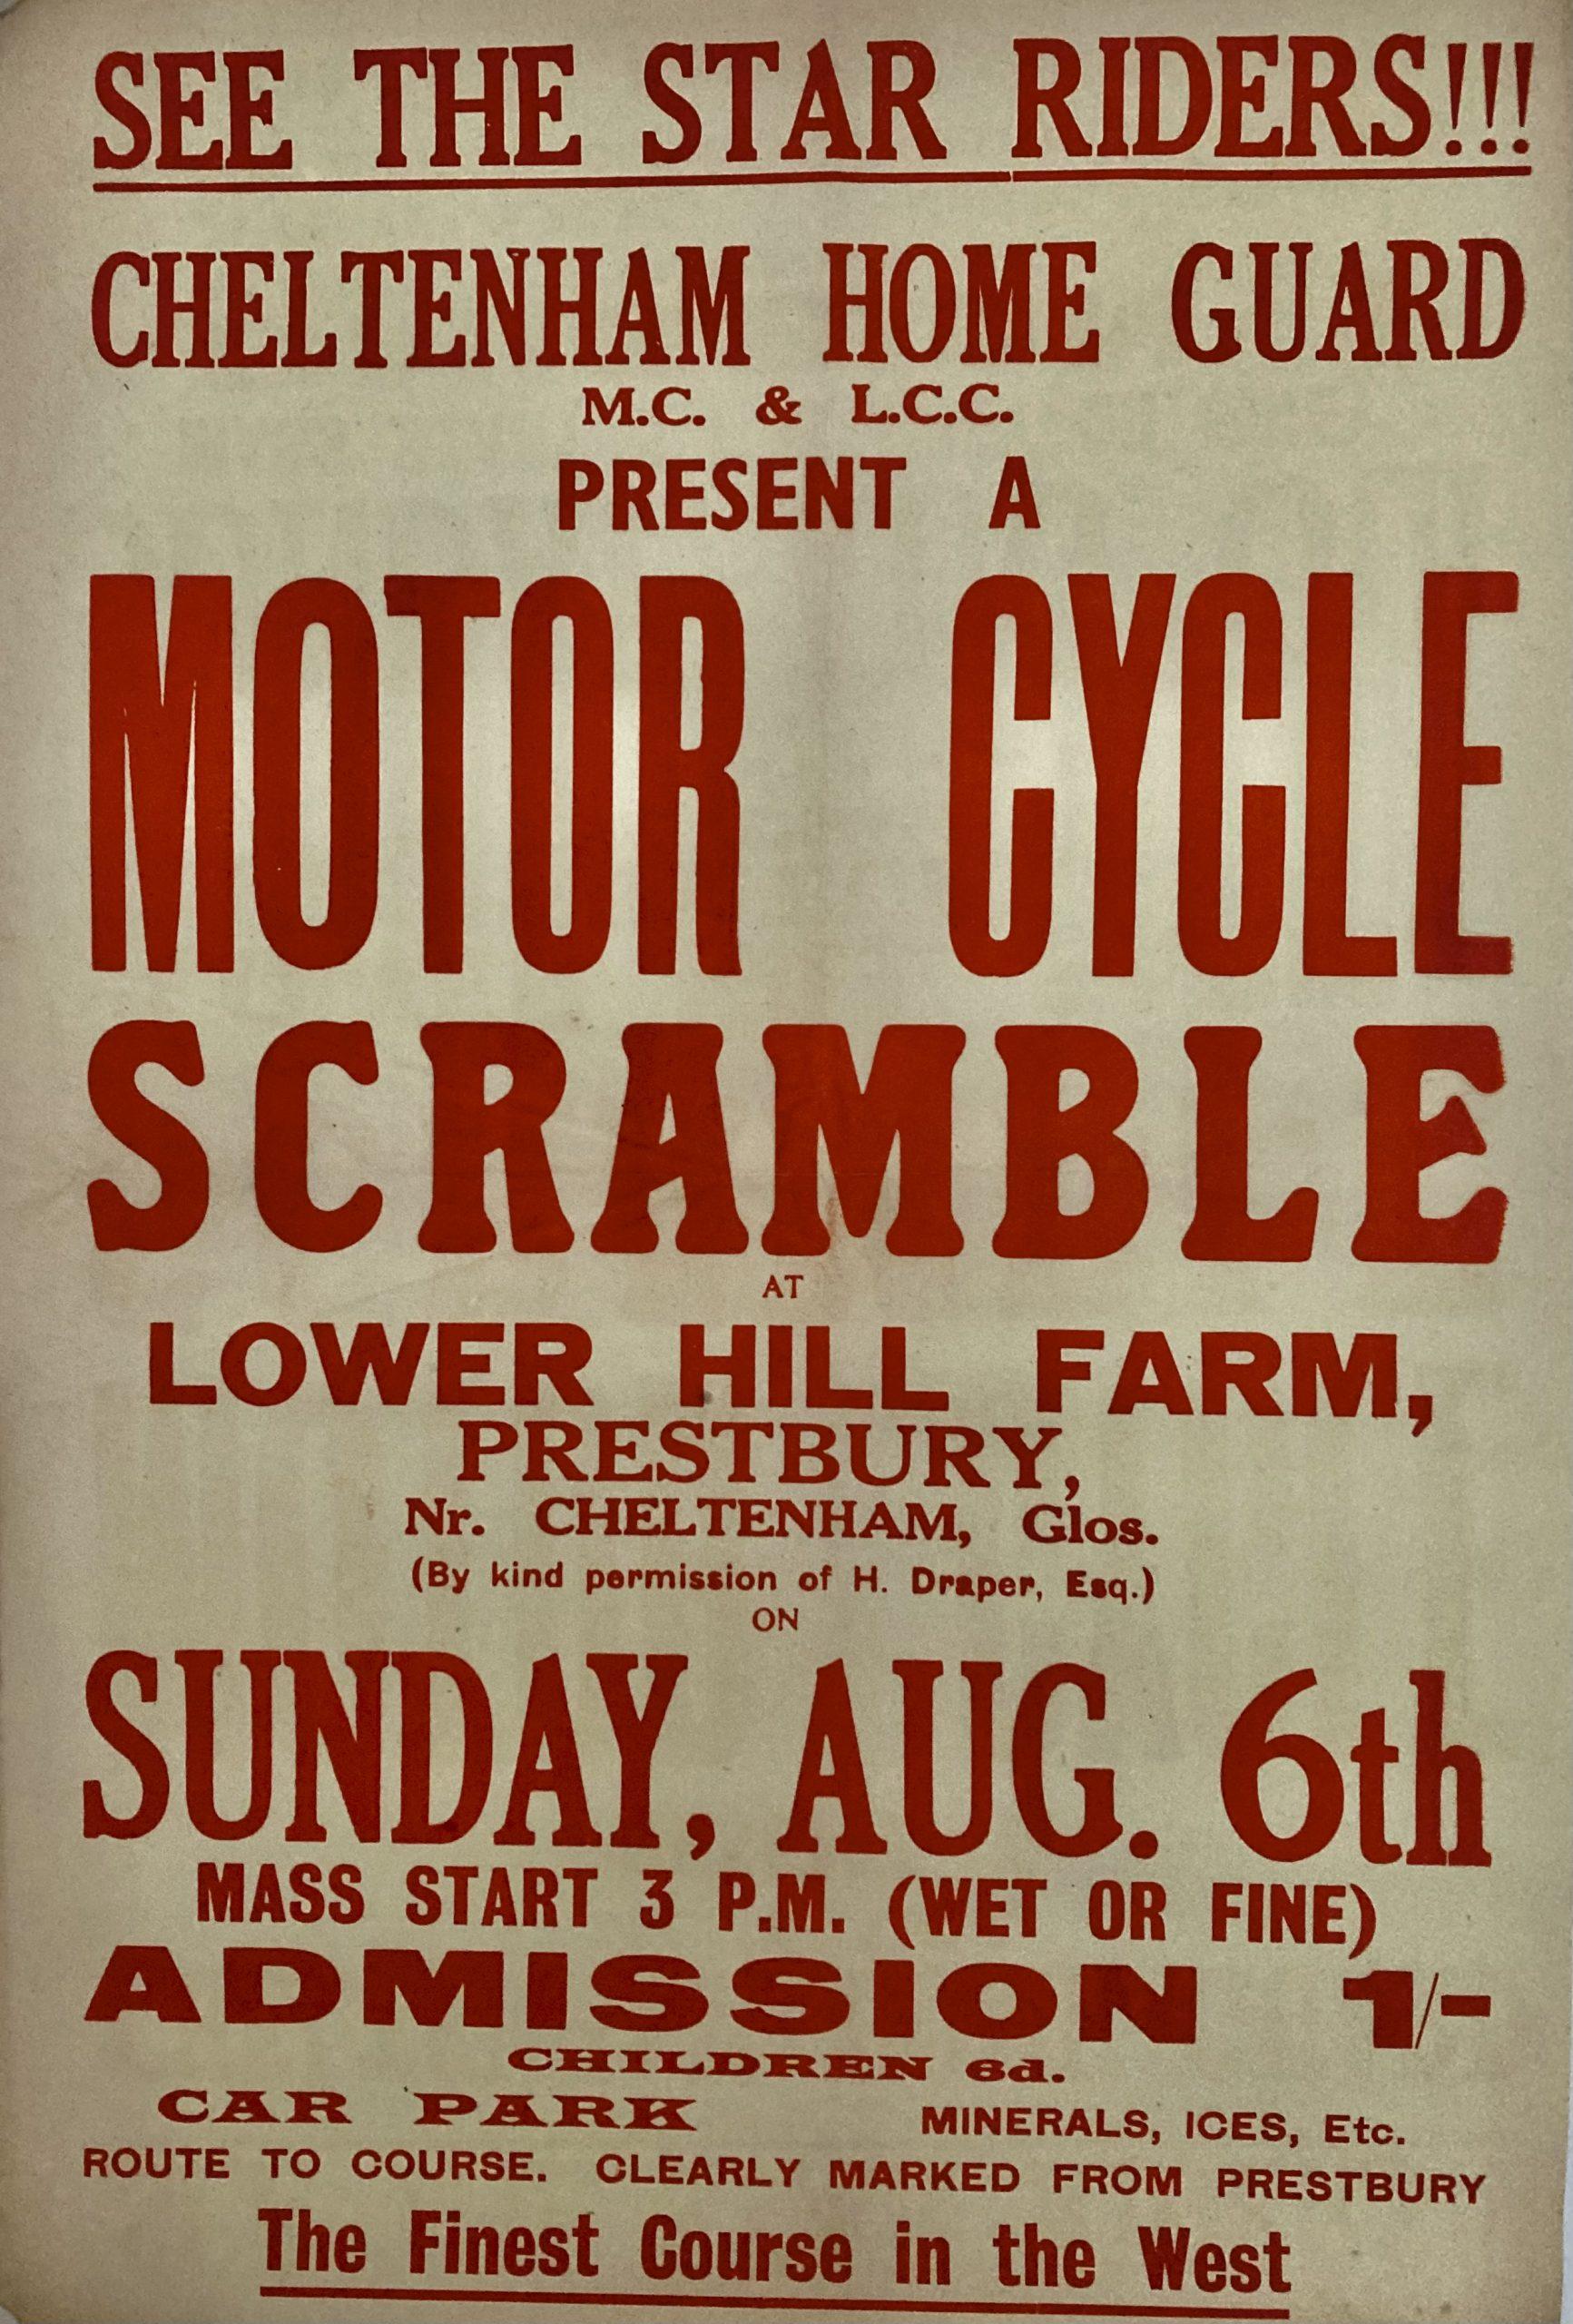 letterpress poster motor cycle scramble Lower Hill Farm